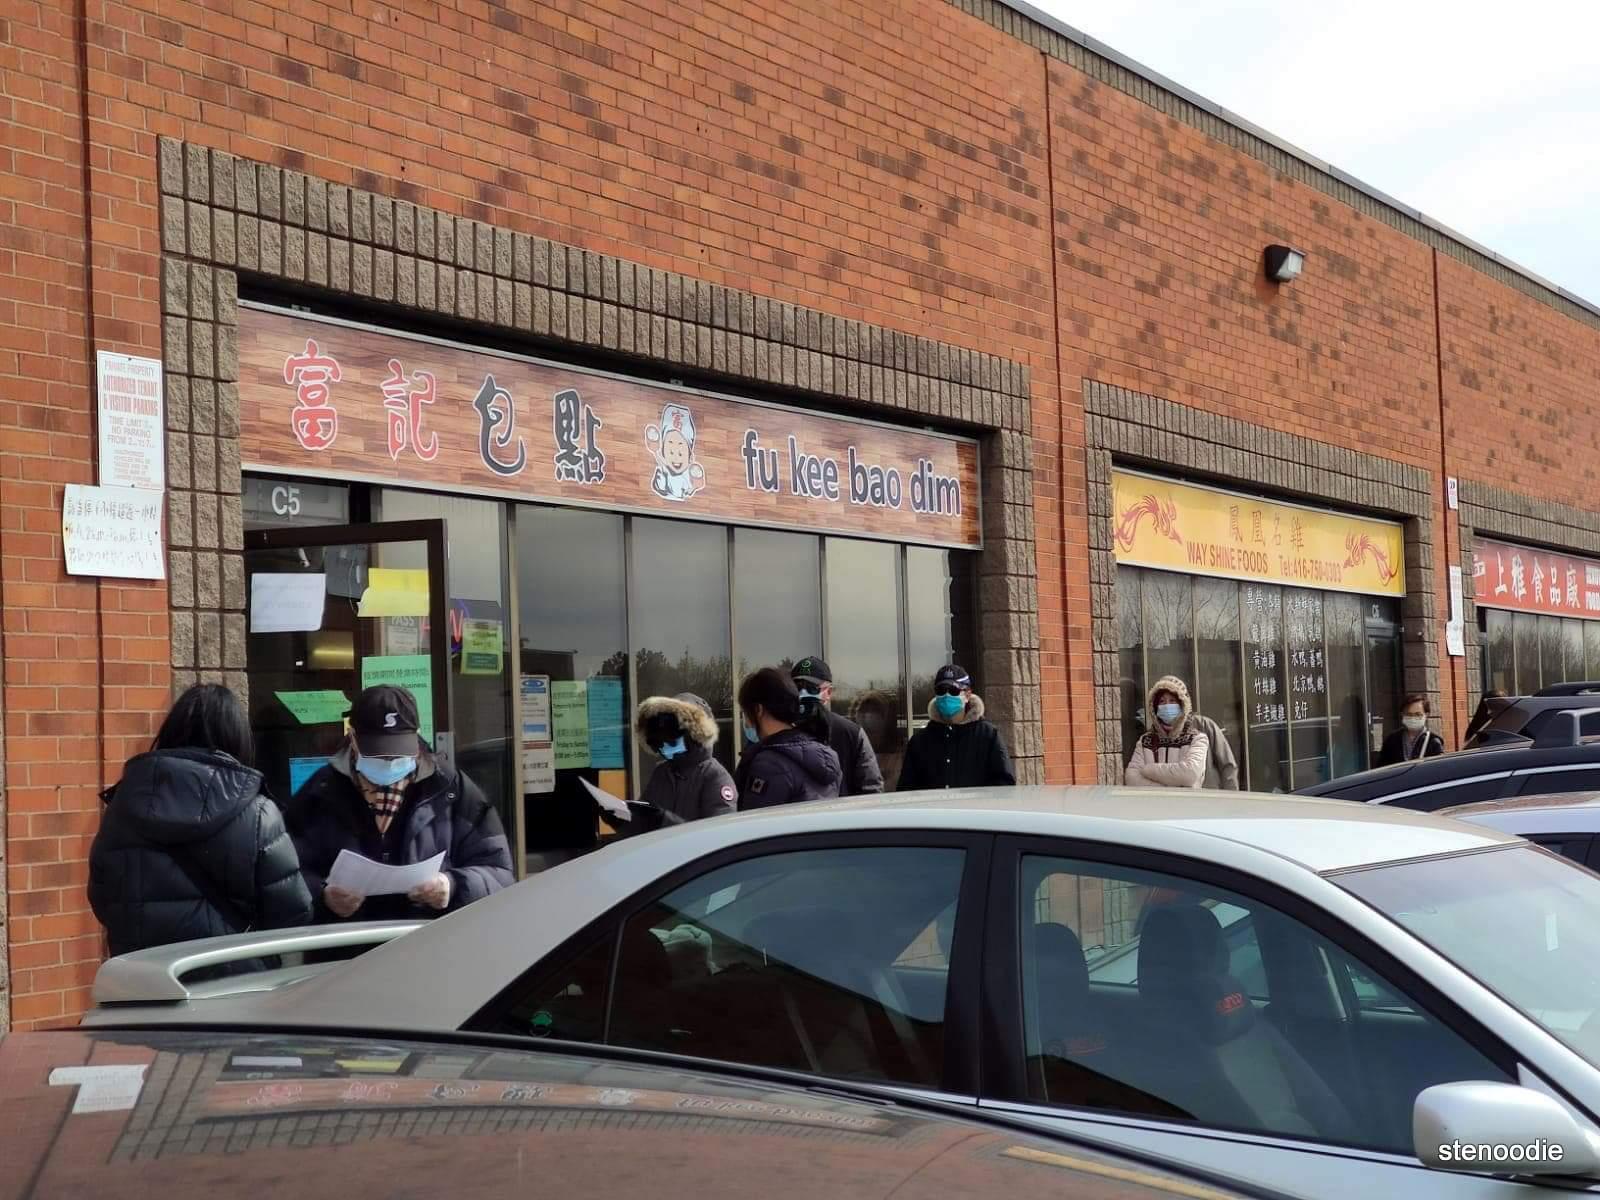 Fu Kee Dim Sum storefront